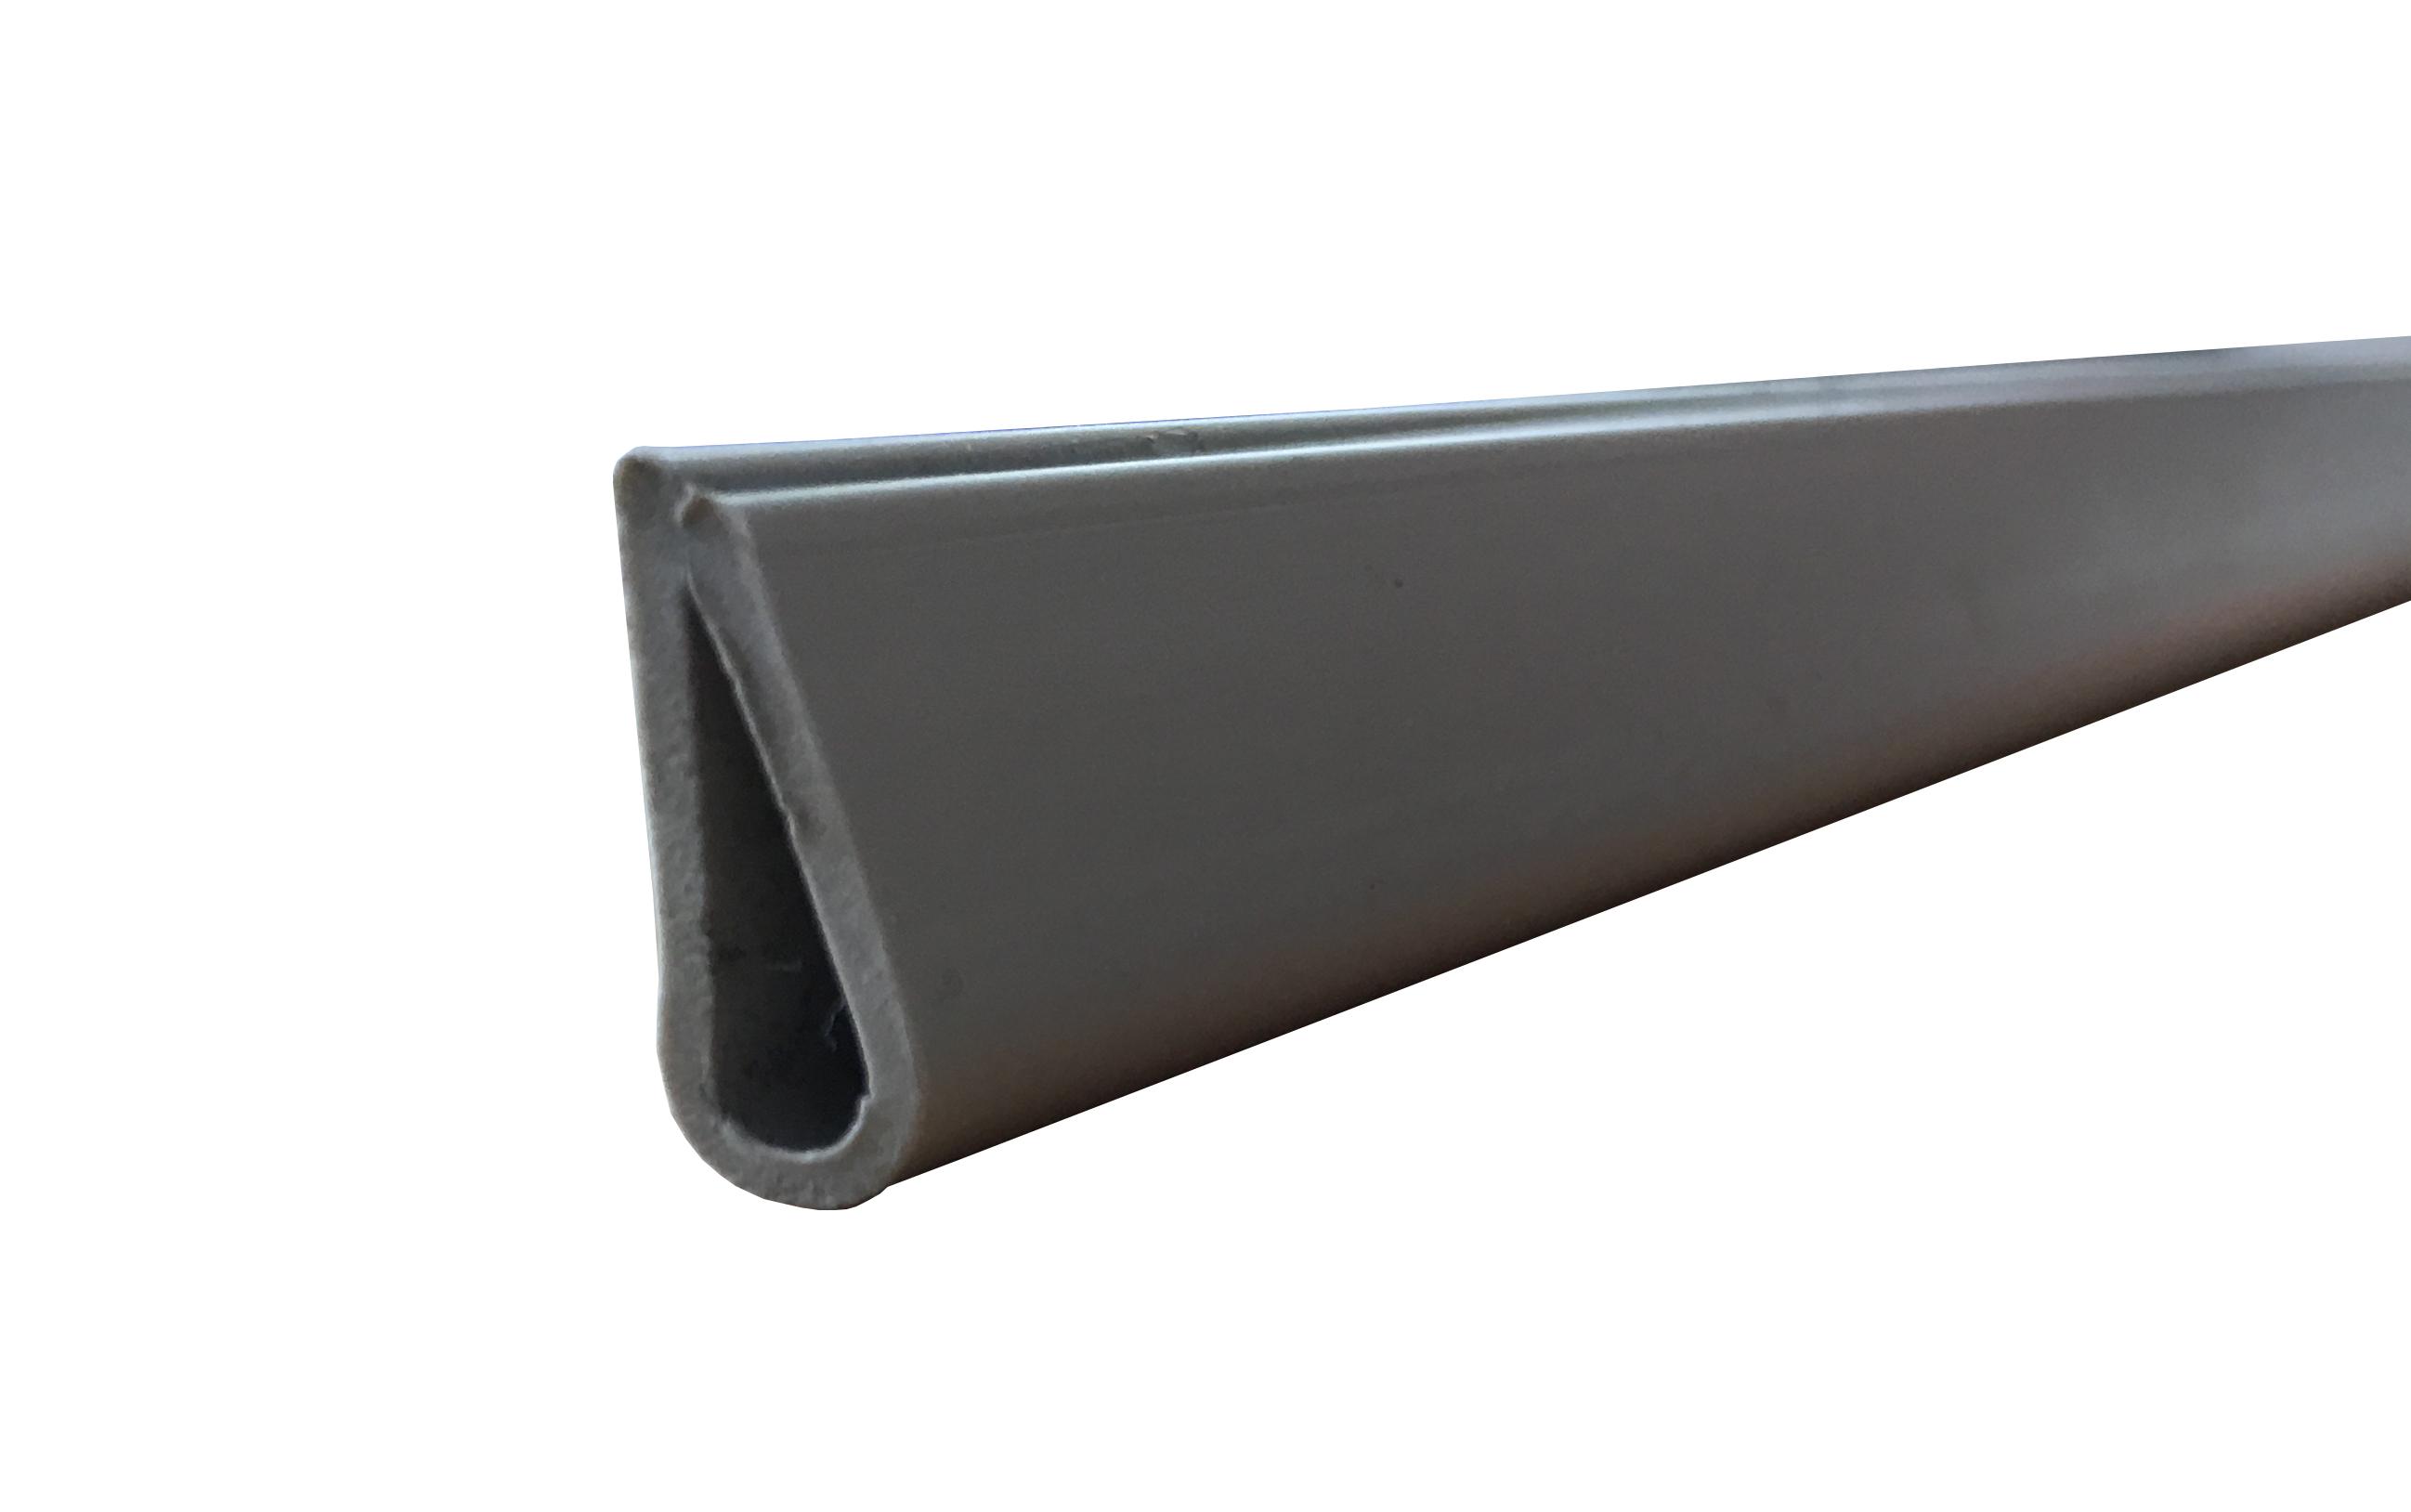 1 Stk Kantenschutzprofil PVC, 1000mm, grau IL14030---